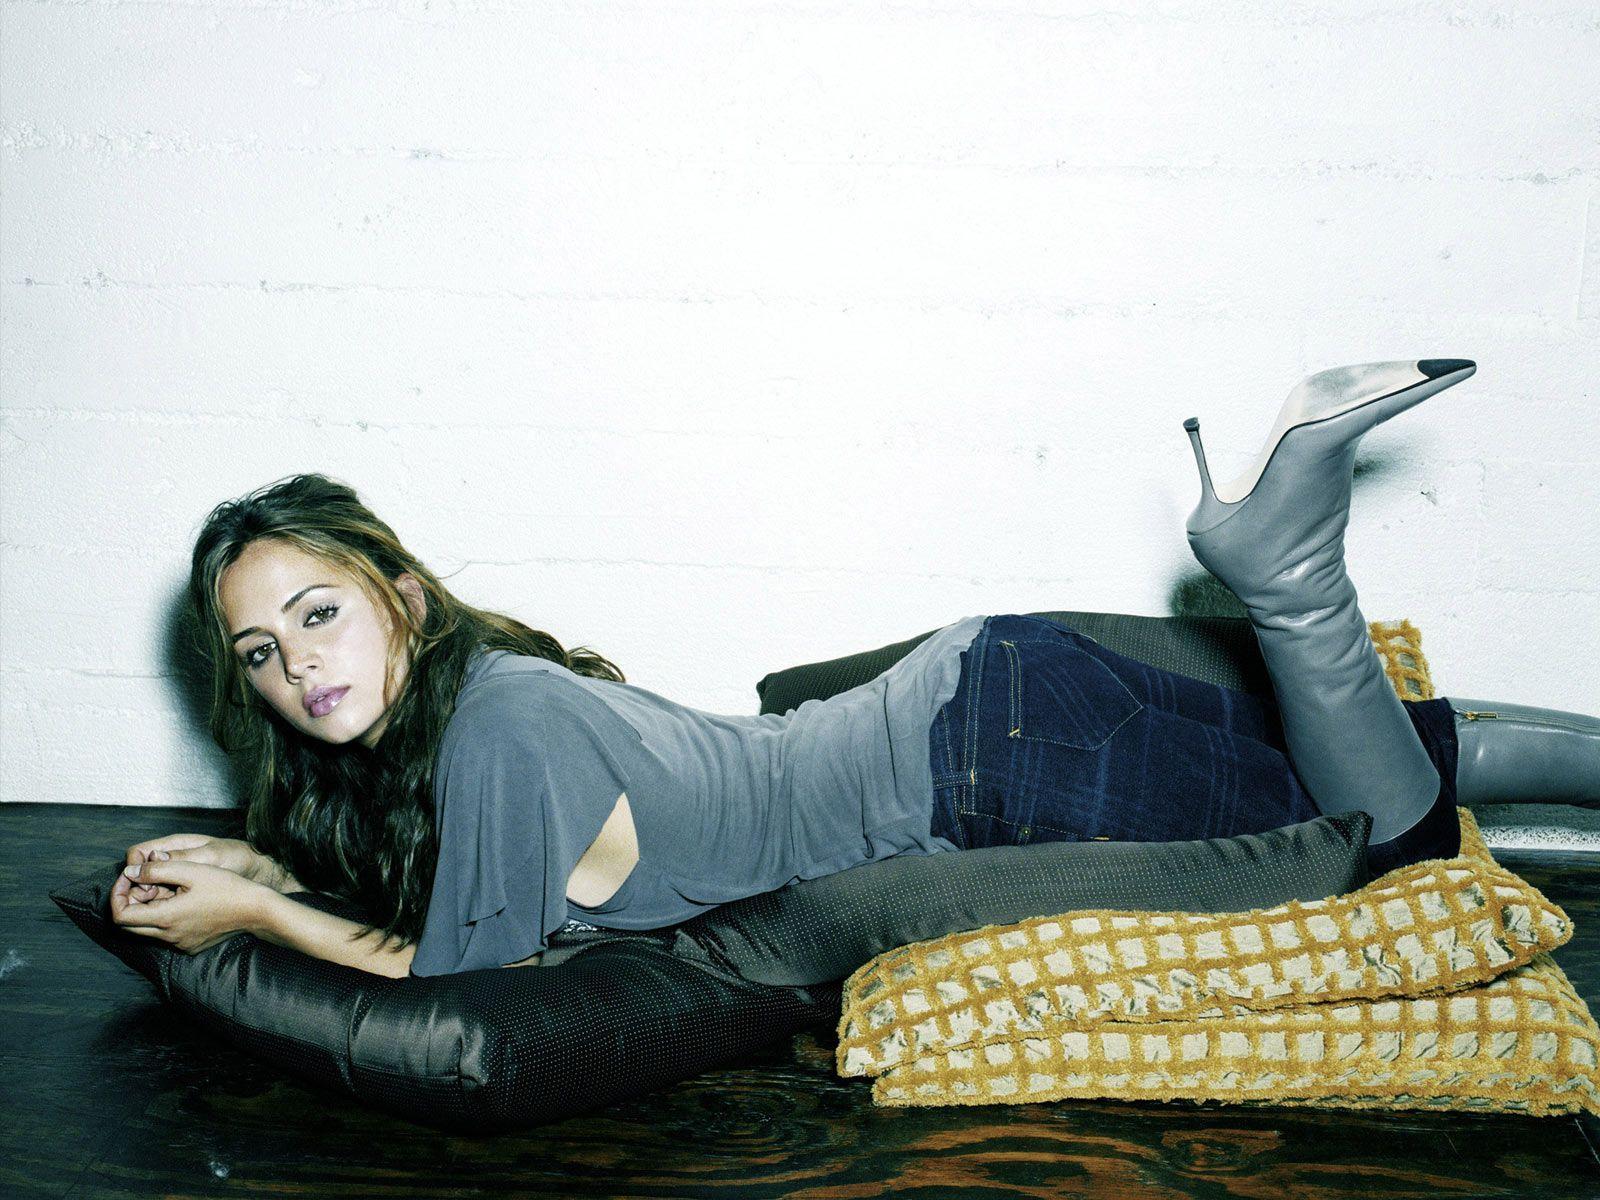 50 Hot Hollywood Celebrity Babes Desktop Wallpapers   1600 x 1200 1600x1200